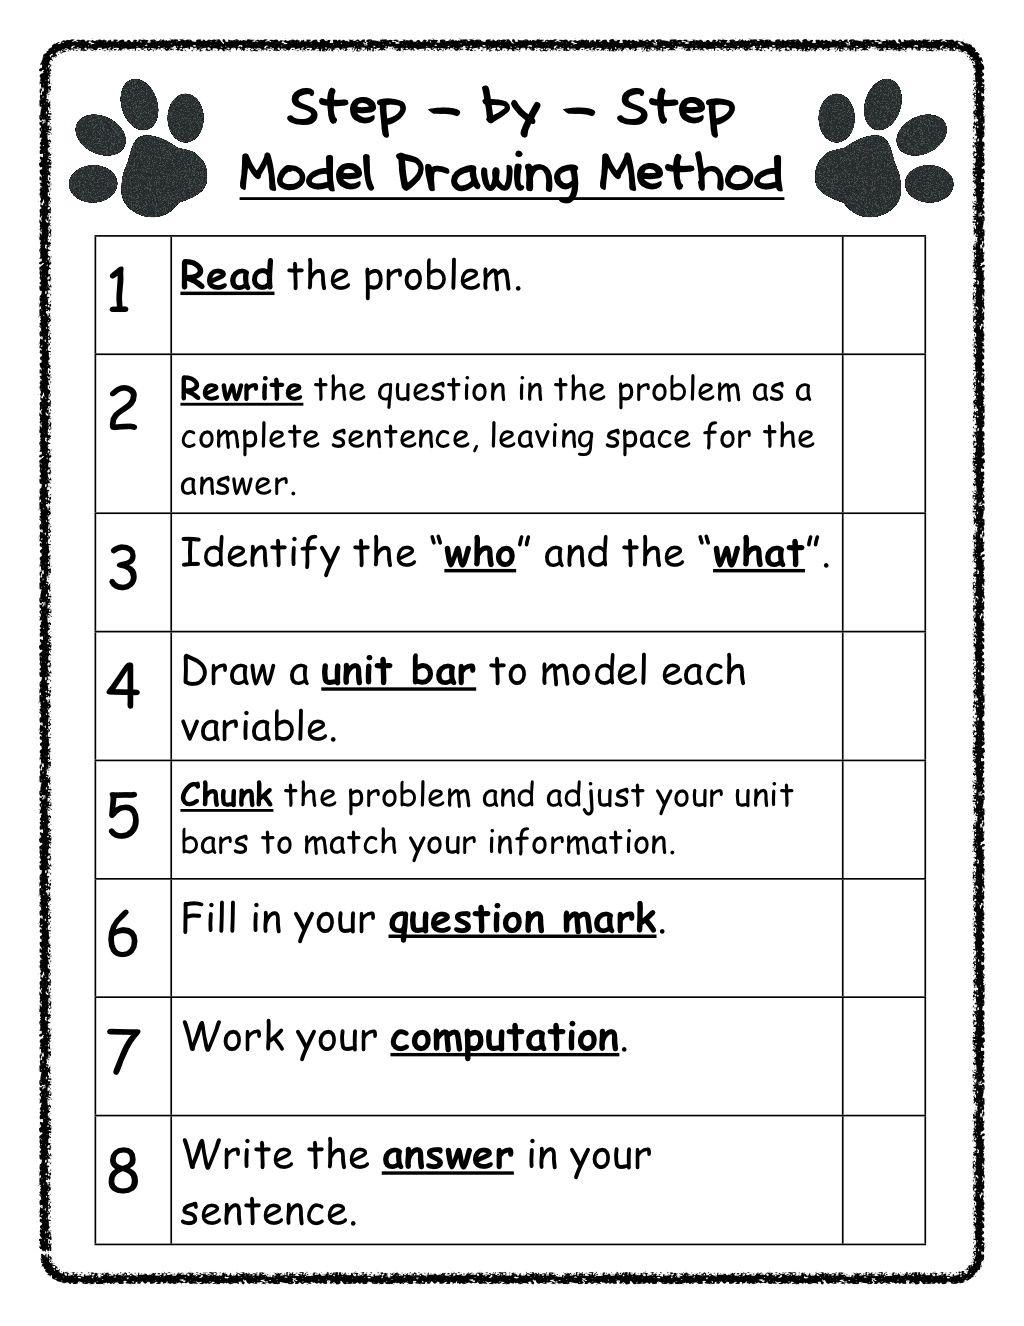 Model Drawing Steps